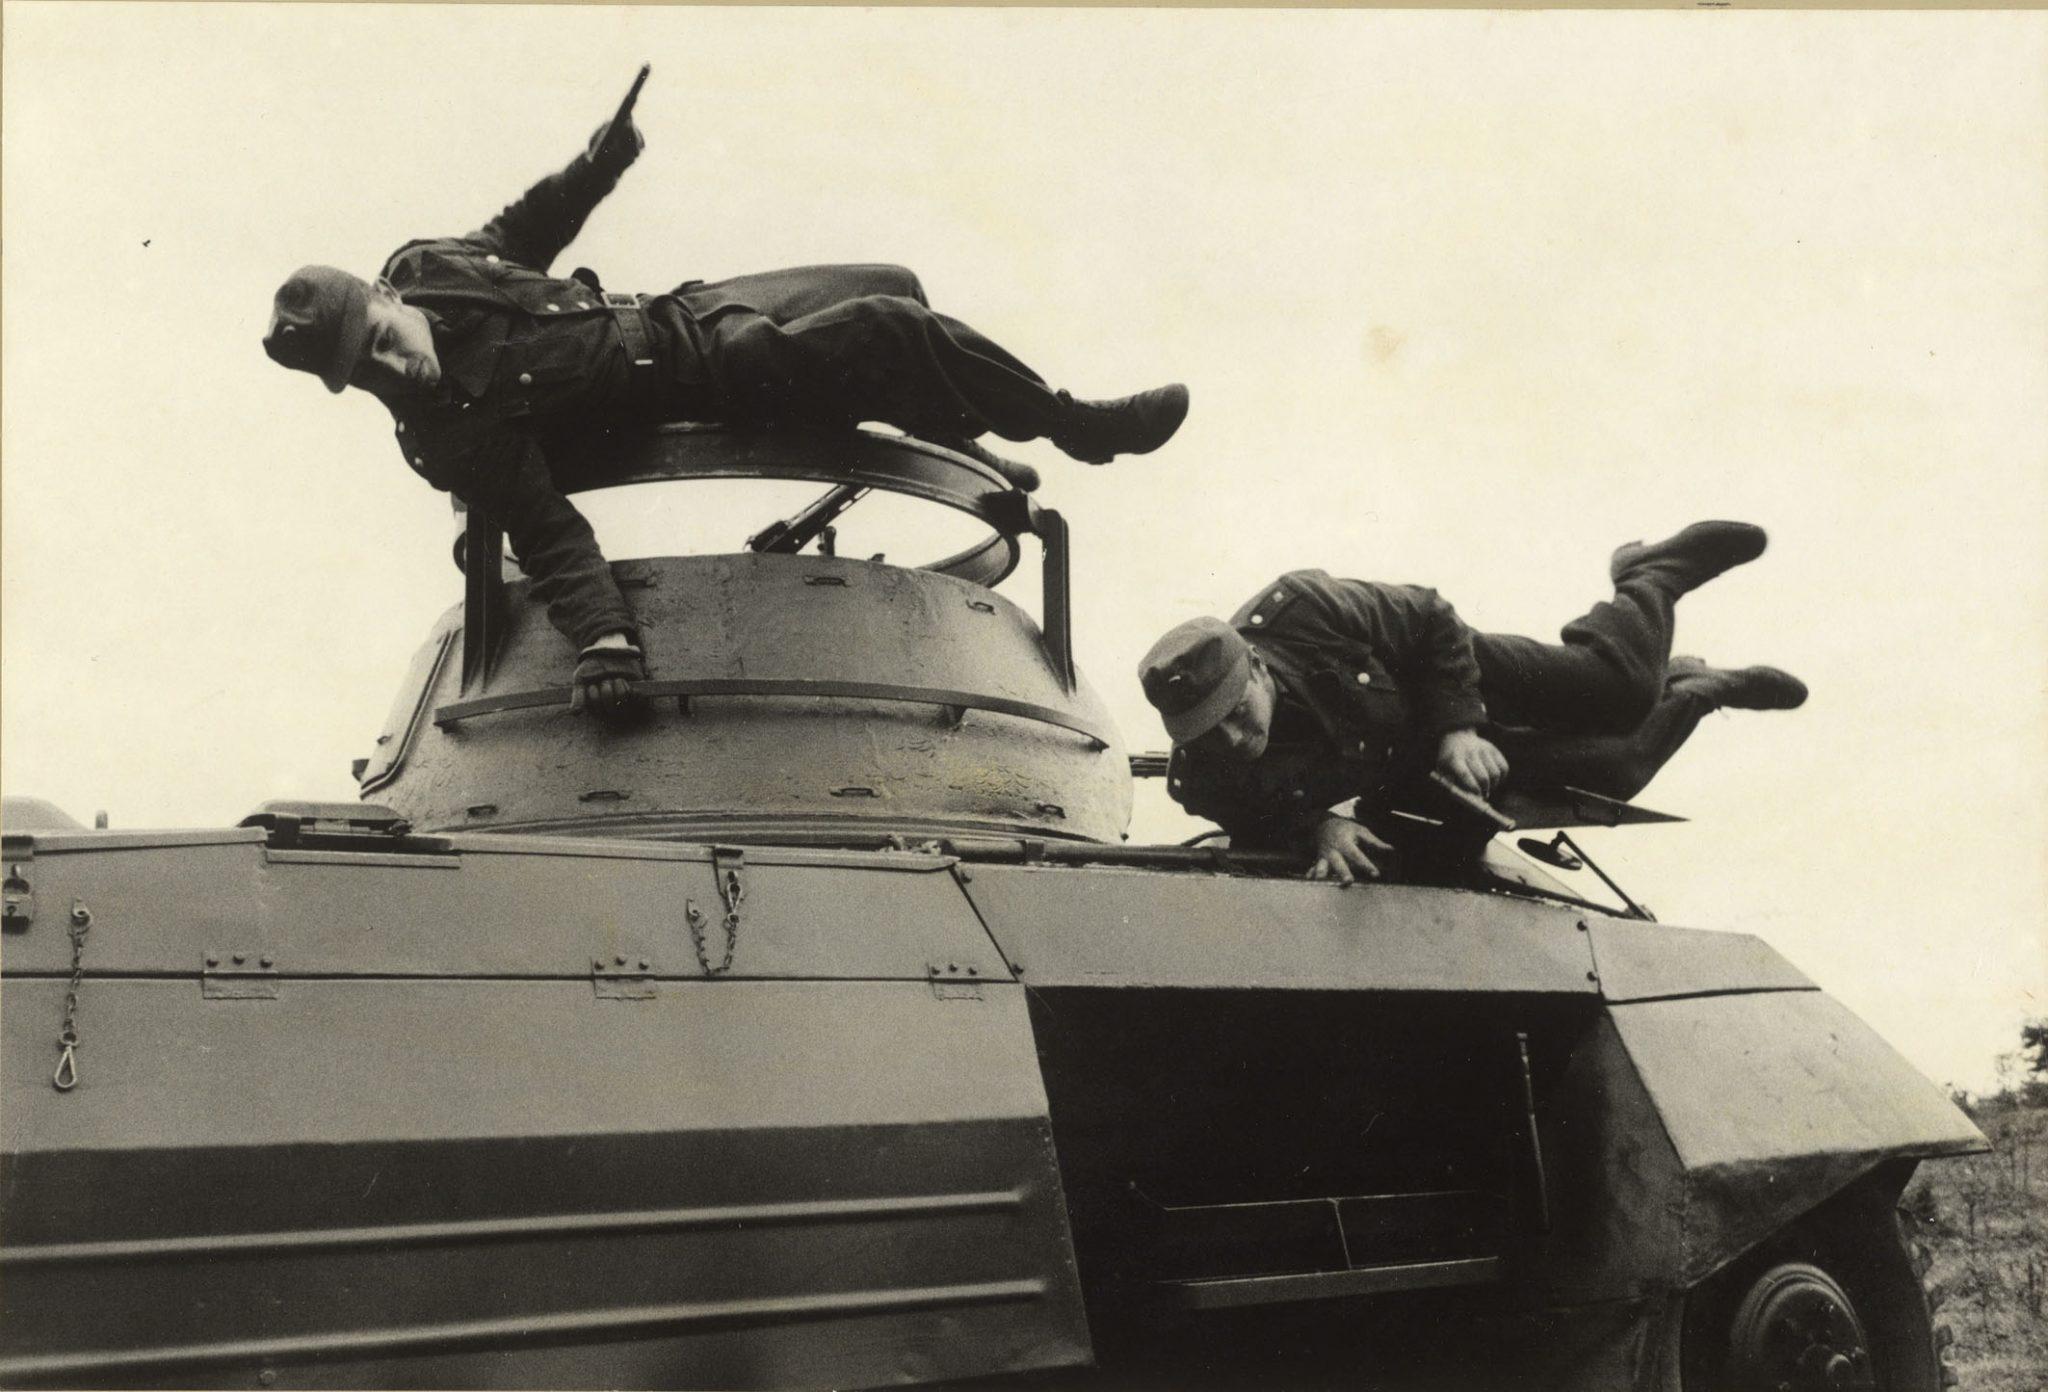 Erich Lessing: German Border Patrol at maneuvers, Coburg, Germany, 1953 copy: © Erich Lessing / Magnum Photos